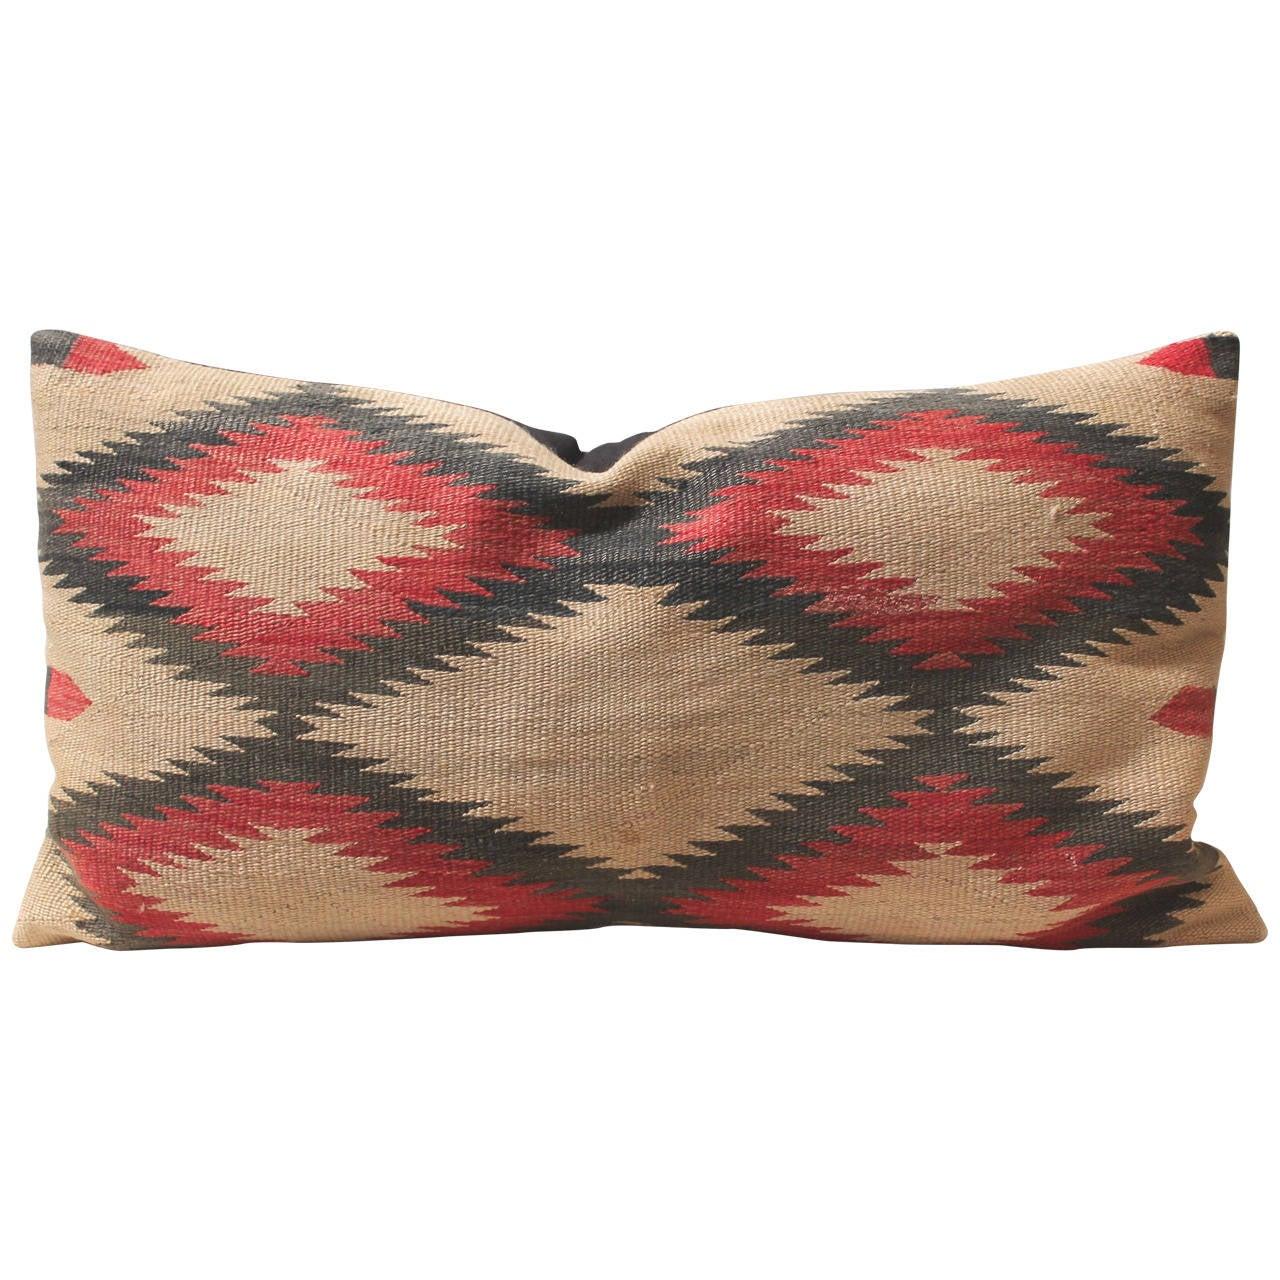 Large Early Navajo Indian Weaving Eye Dazzler Pillow